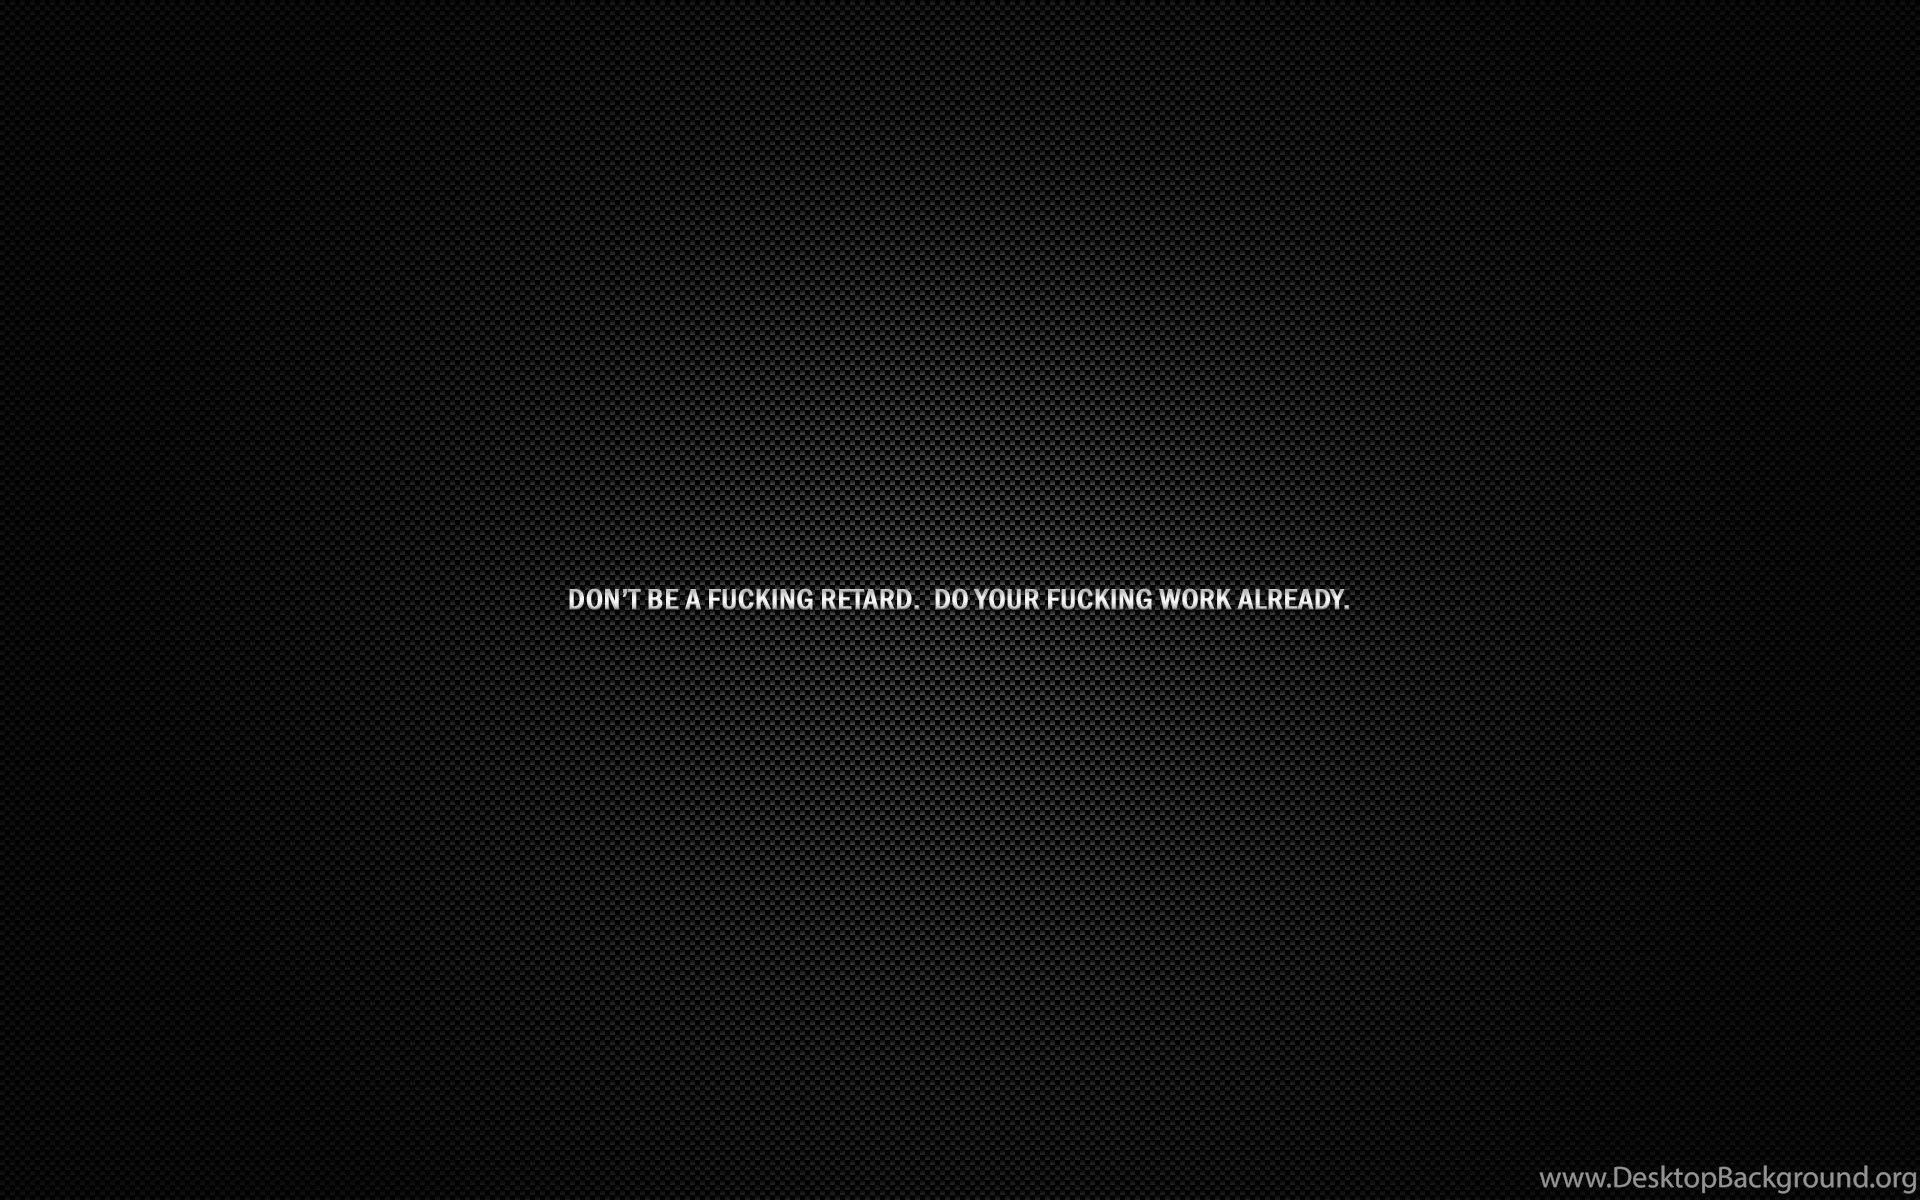 Inspirational Quotes White Background Quotesgram Desktop Background